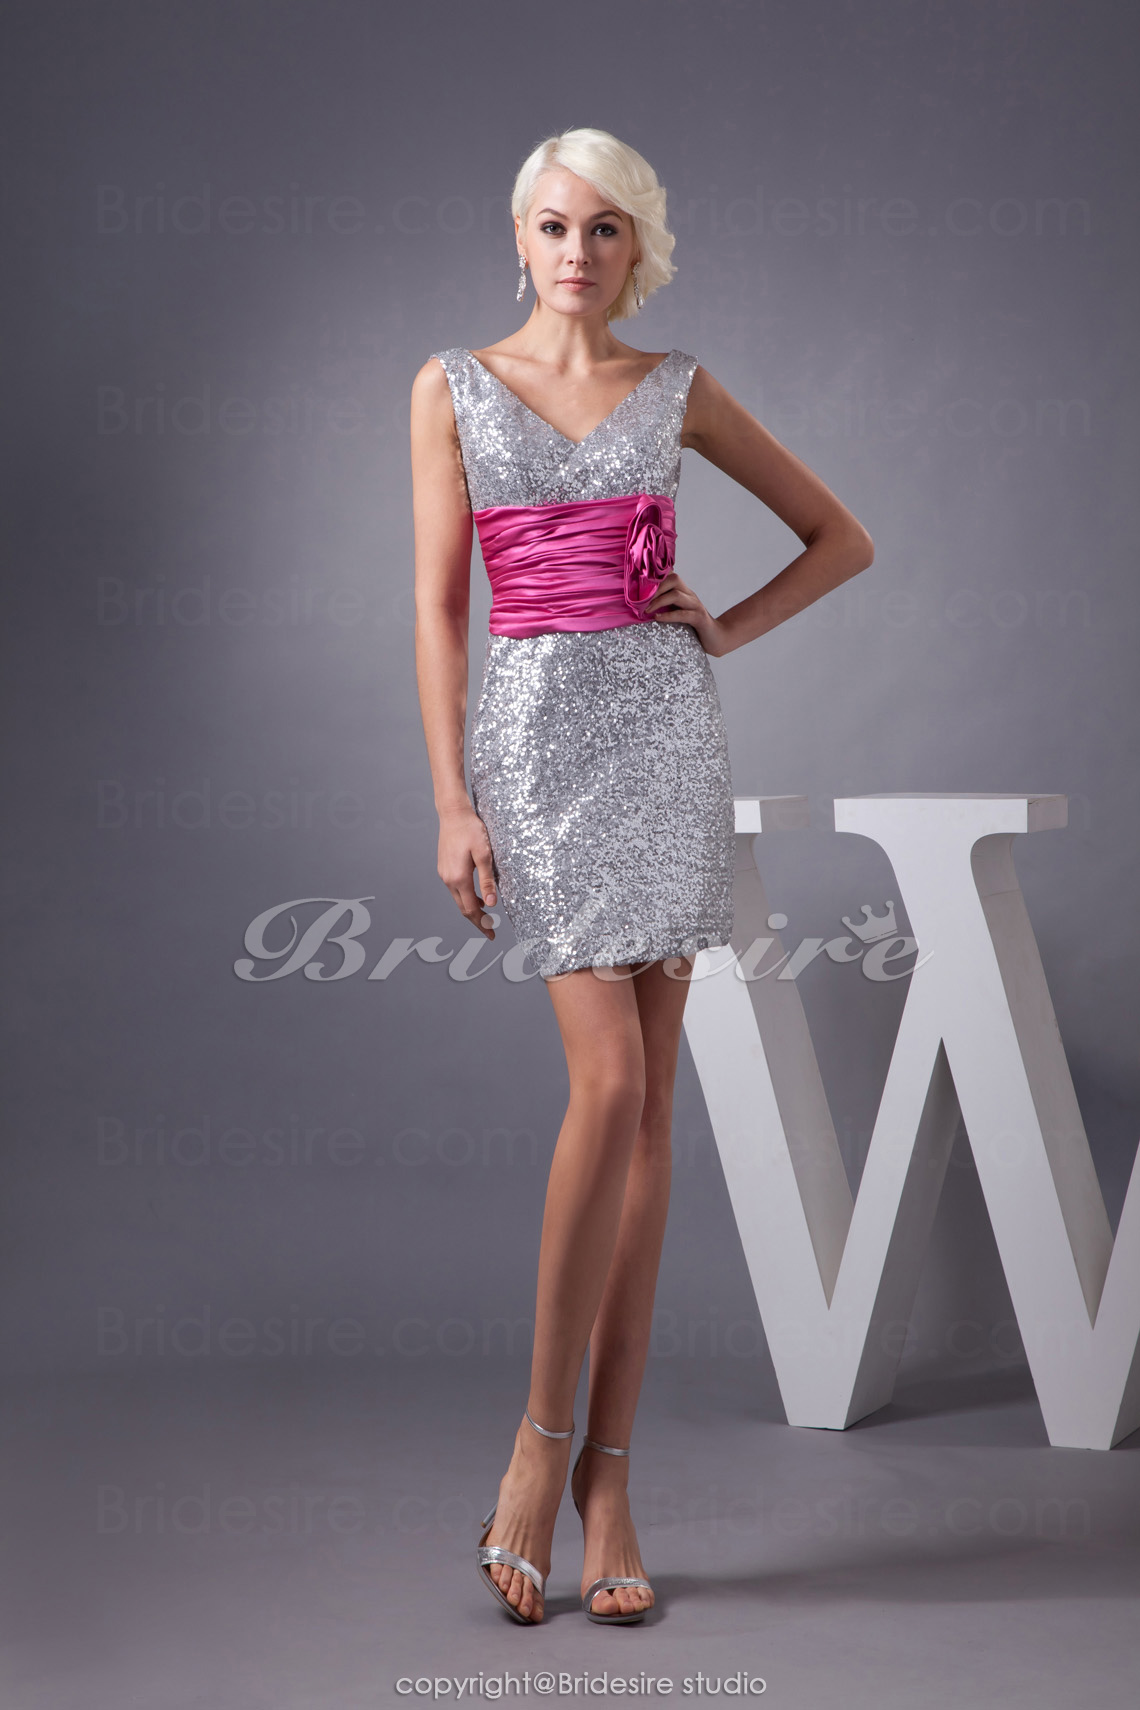 1785f3e9686e75 Bridesire - Schede Kolom V-hals Korte broek   Mini Mouwloos Lovertjes  Stretch Satijn Kleding  BD4933  - €83.56   Bridesire